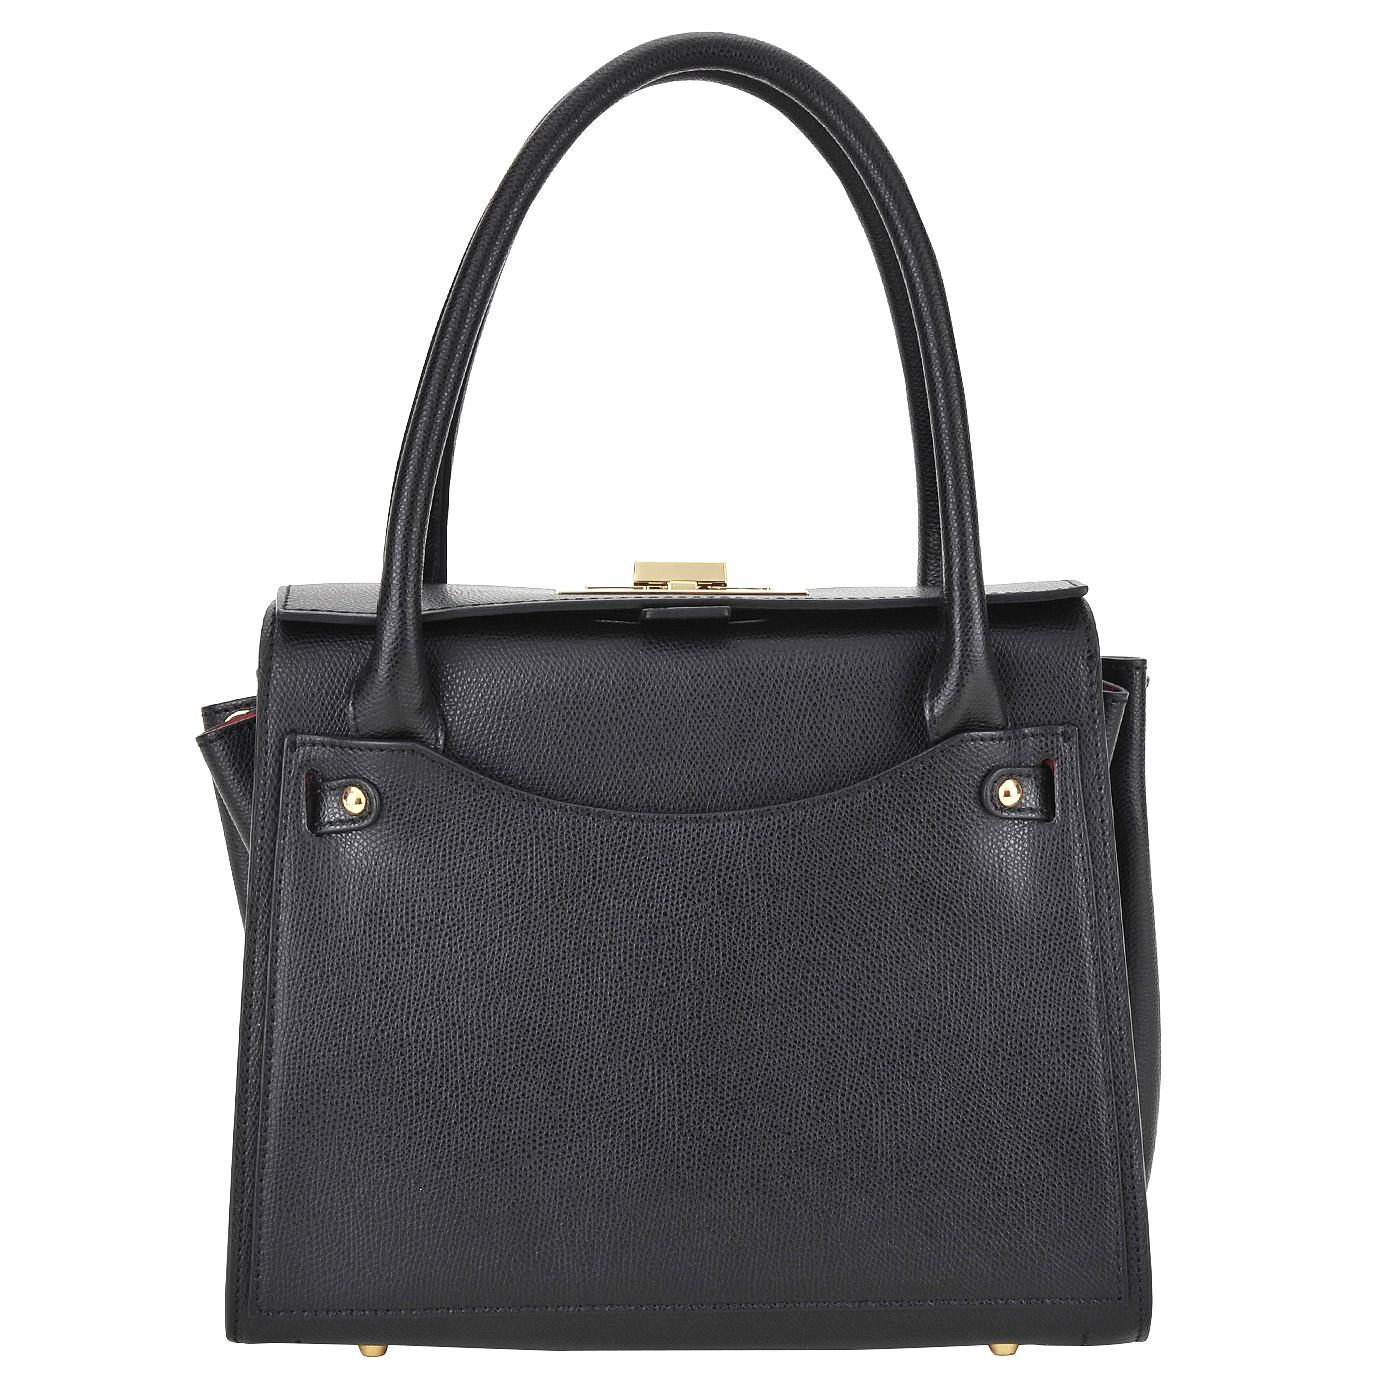 СумкаКлассические сумки<br>Carlo Salvatelli, Lord, сумка жен, н/к, тиснен, черн/красн.<br>